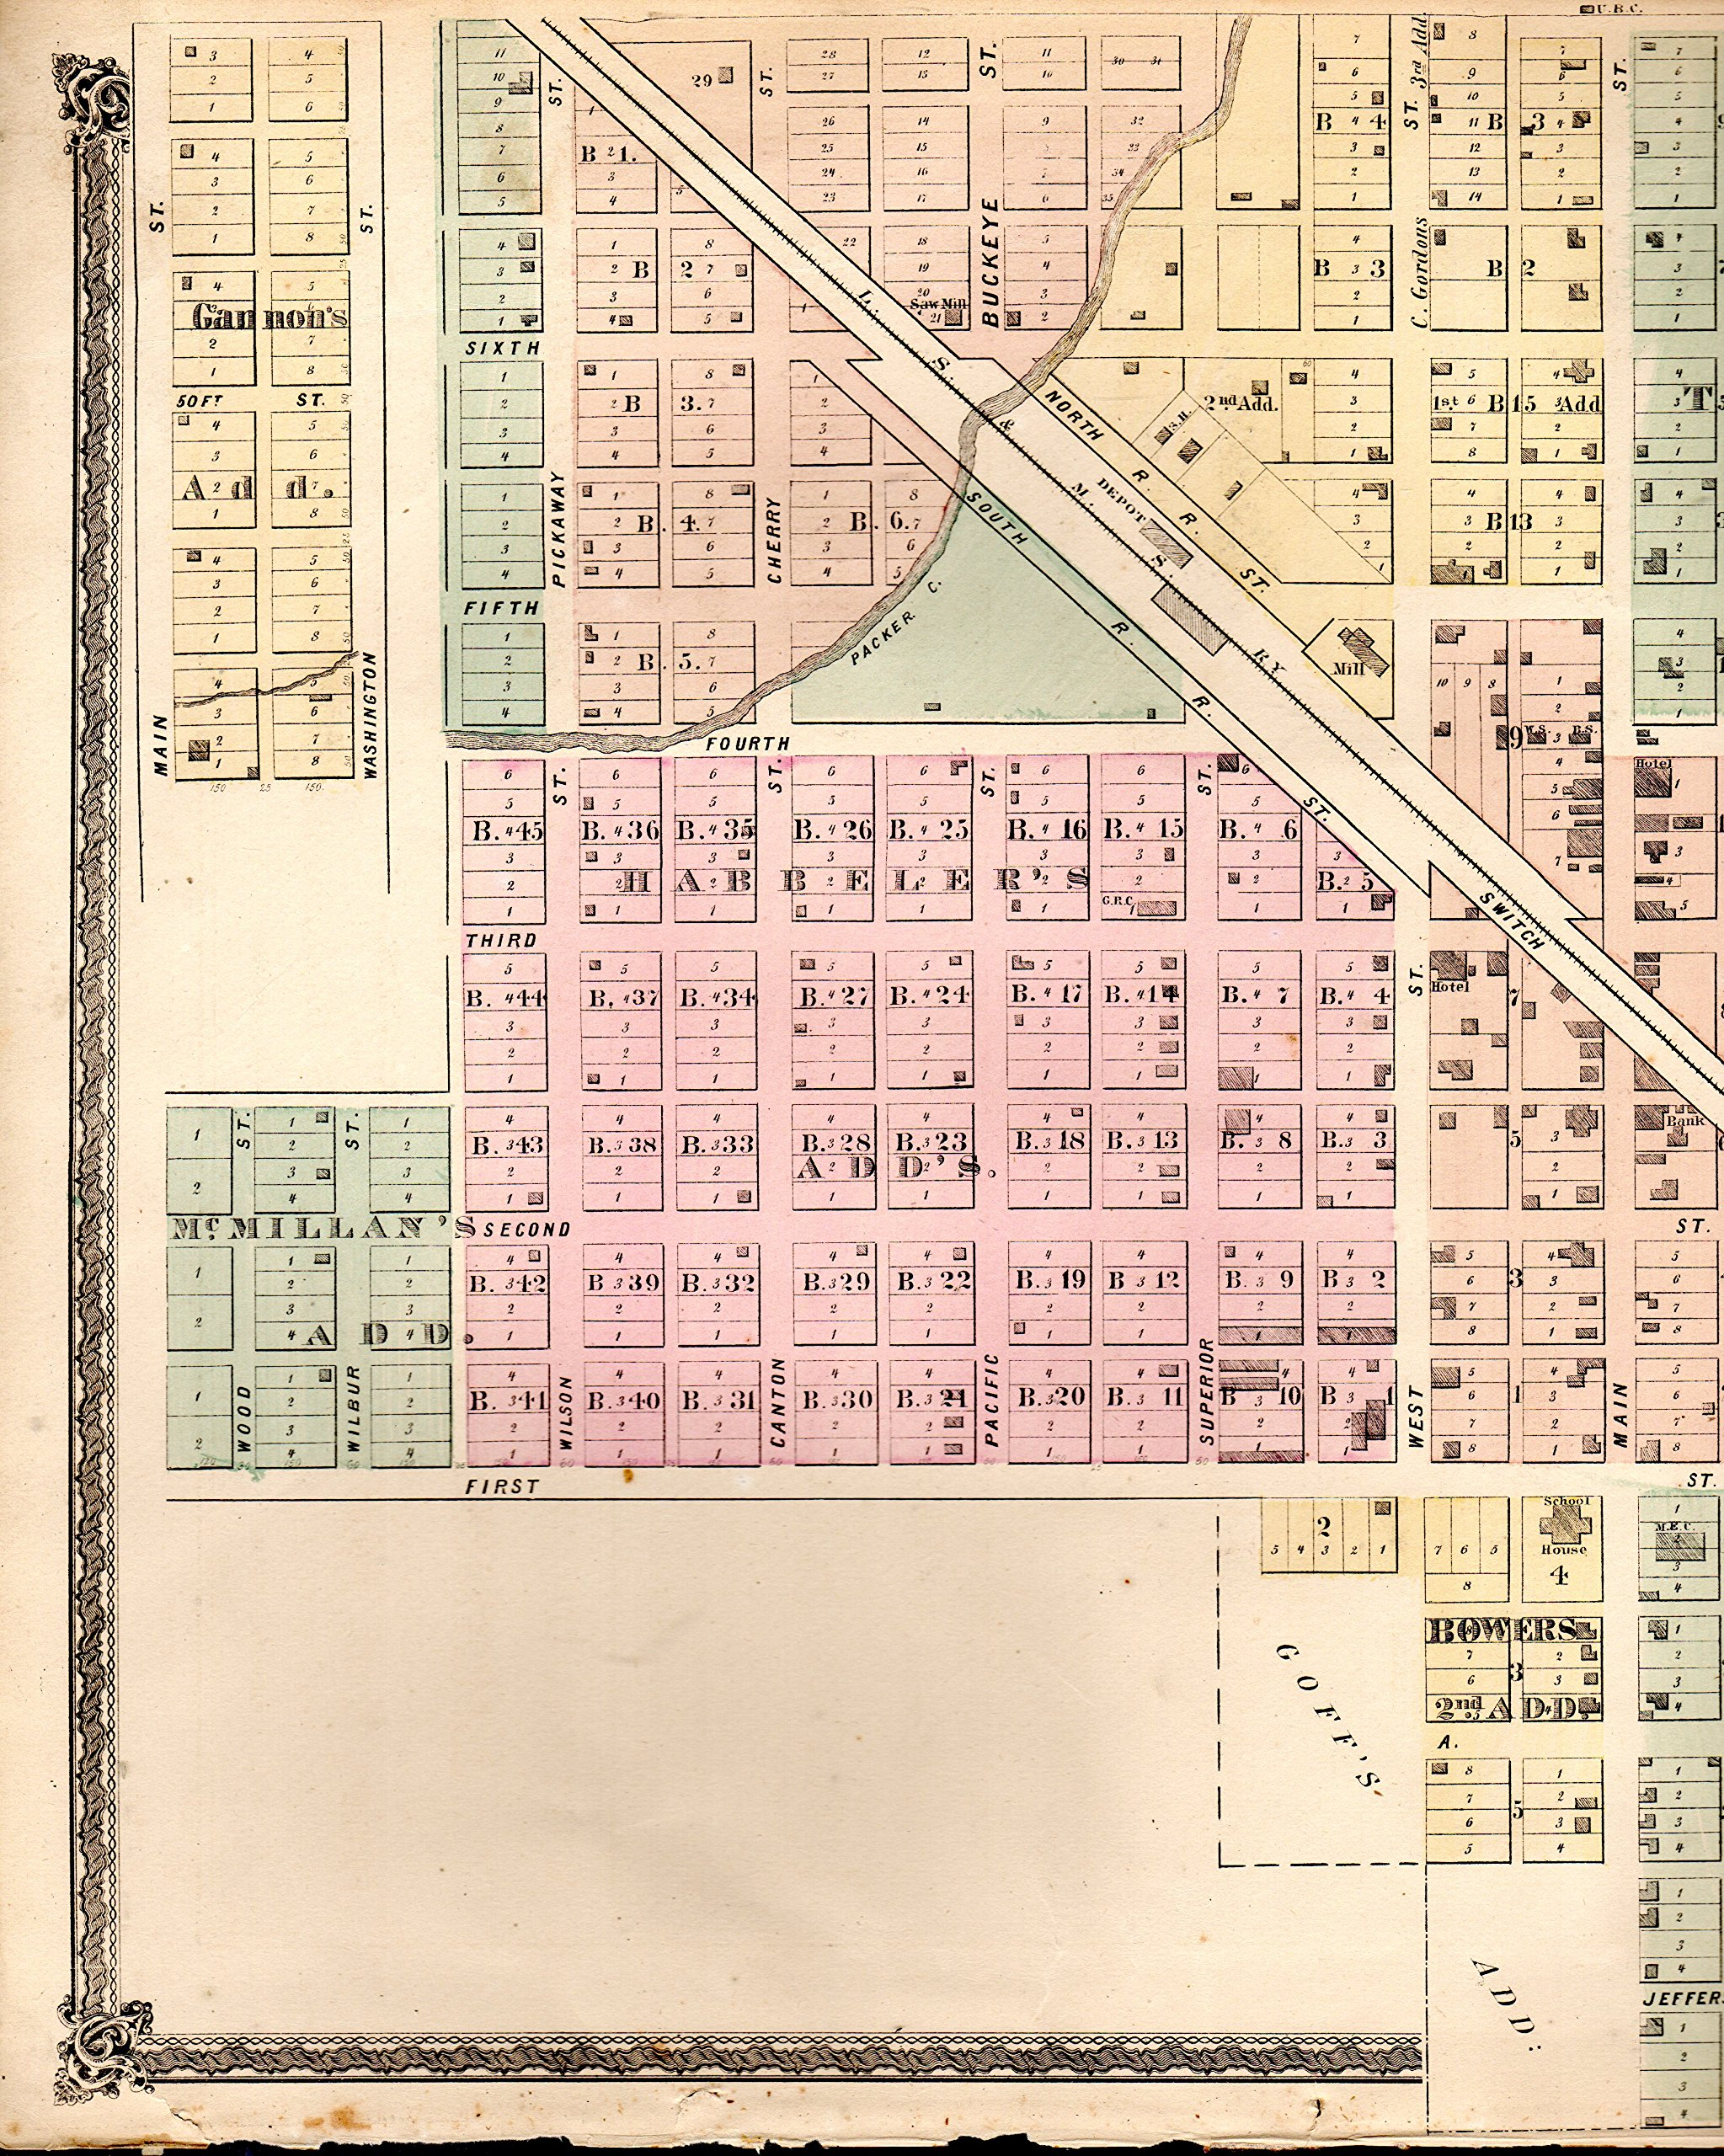 Genoa Ohio Map.Map Genoa Ohio Lake Erie Ohio From Illustrated Historical